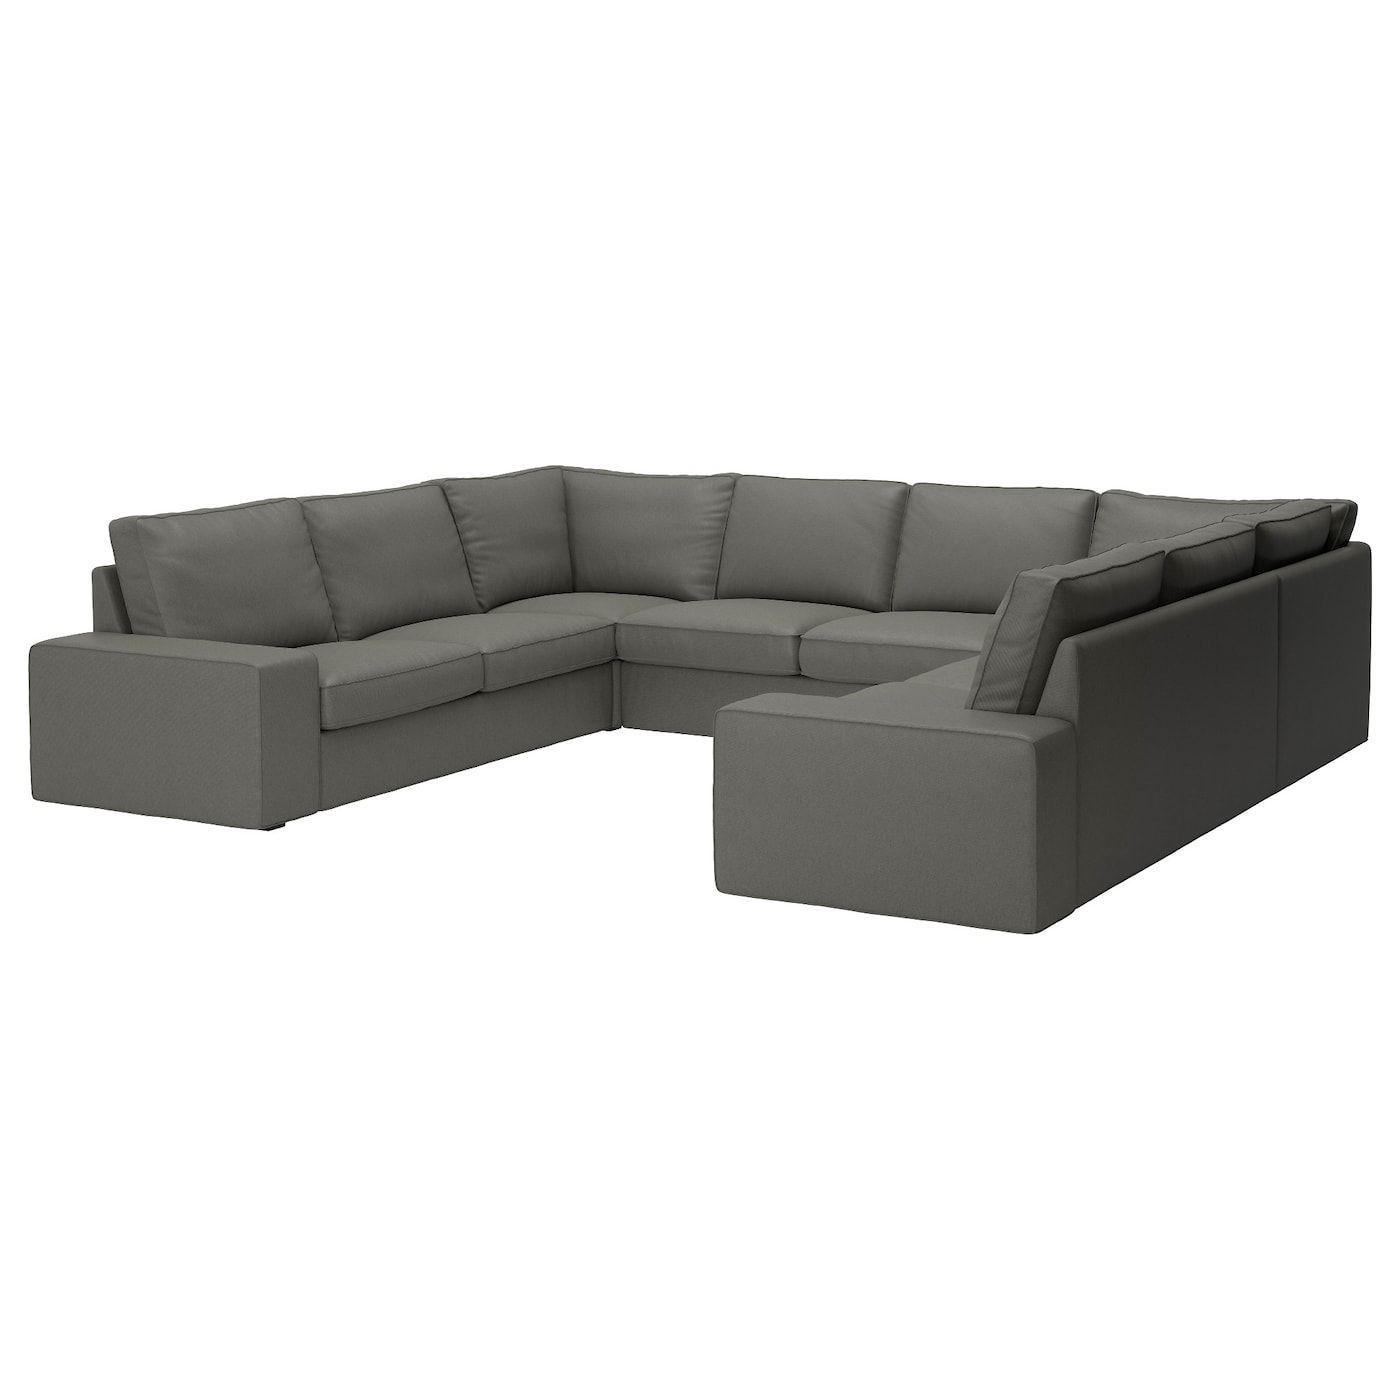 Kivik Sofa U Form 6 Sitzig Borred 8 Platze Graugrun Sofa U Form